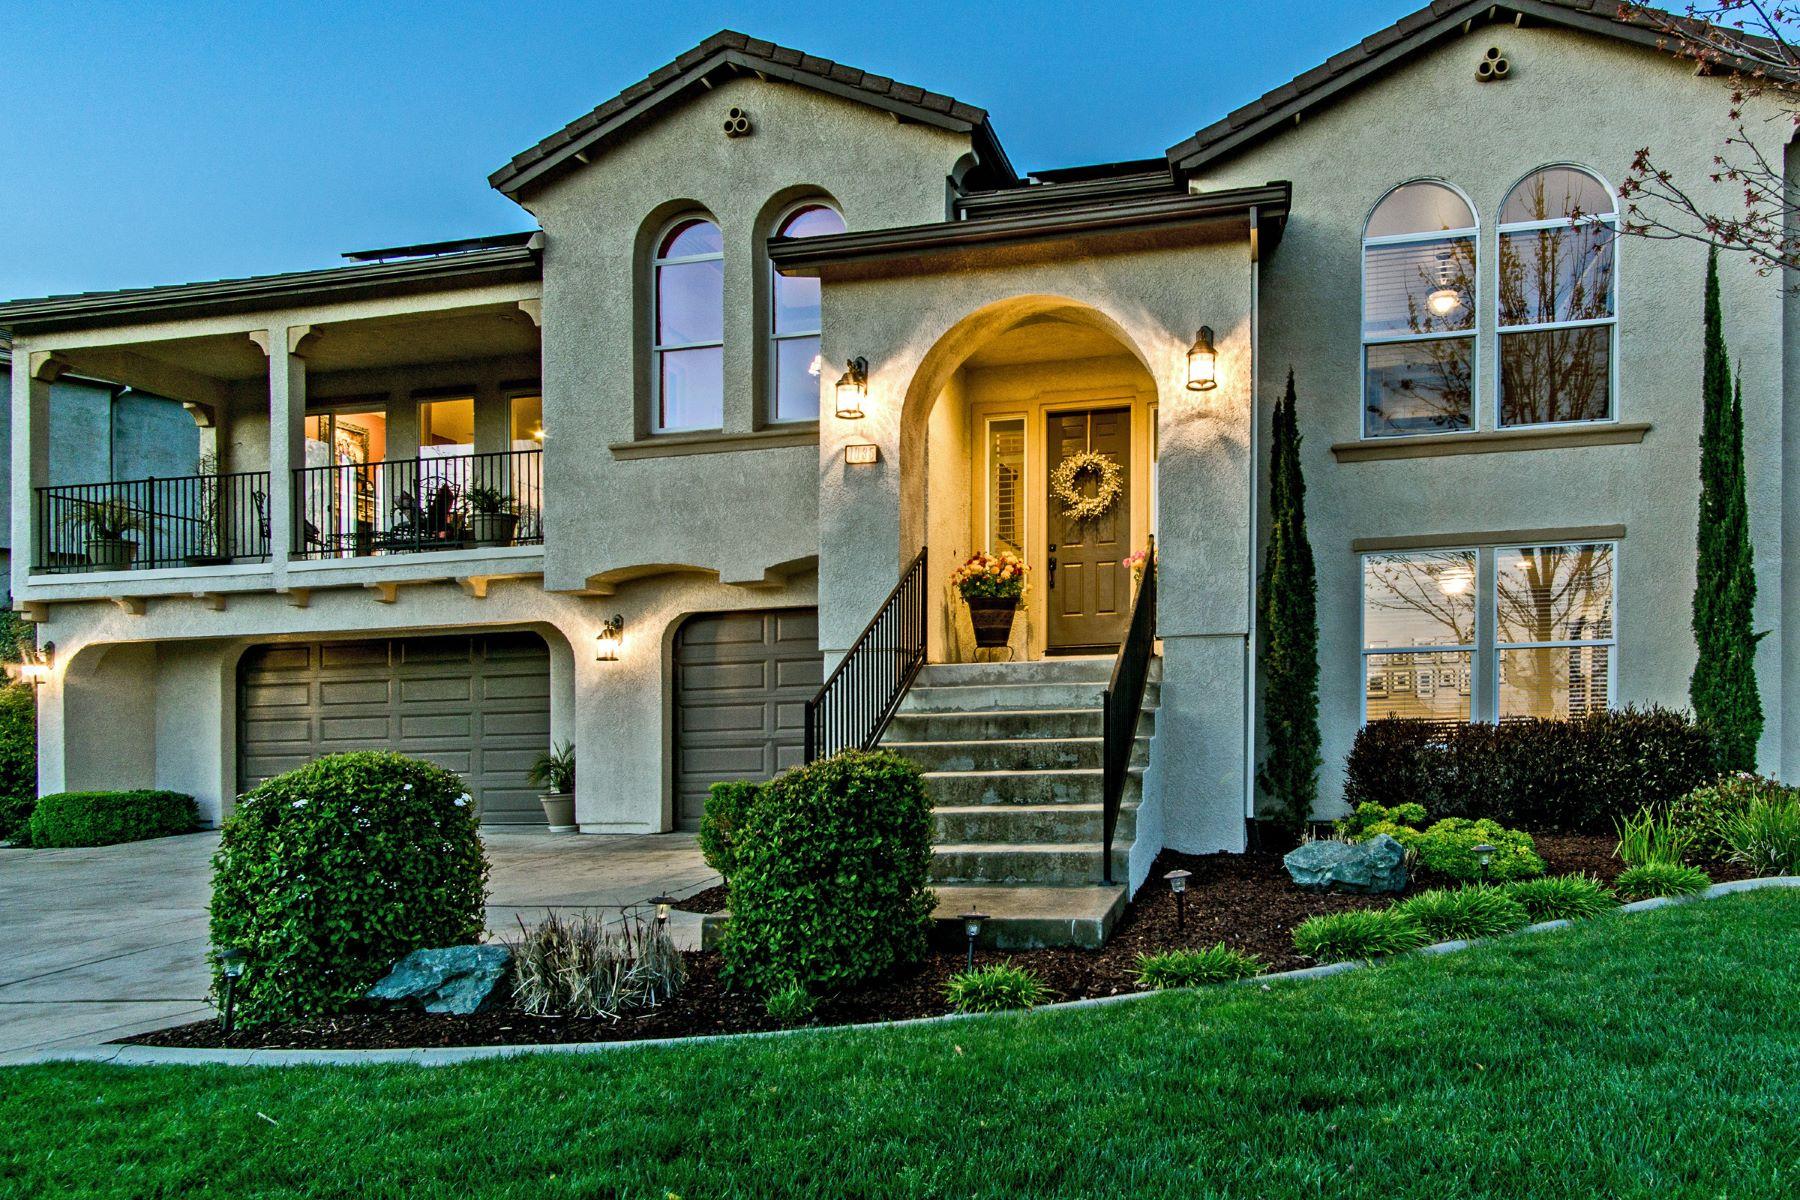 Single Family Home for Sale at Pristine Promontory Gem 1035 Venezia Drive El Dorado Hills, California 95762 United States